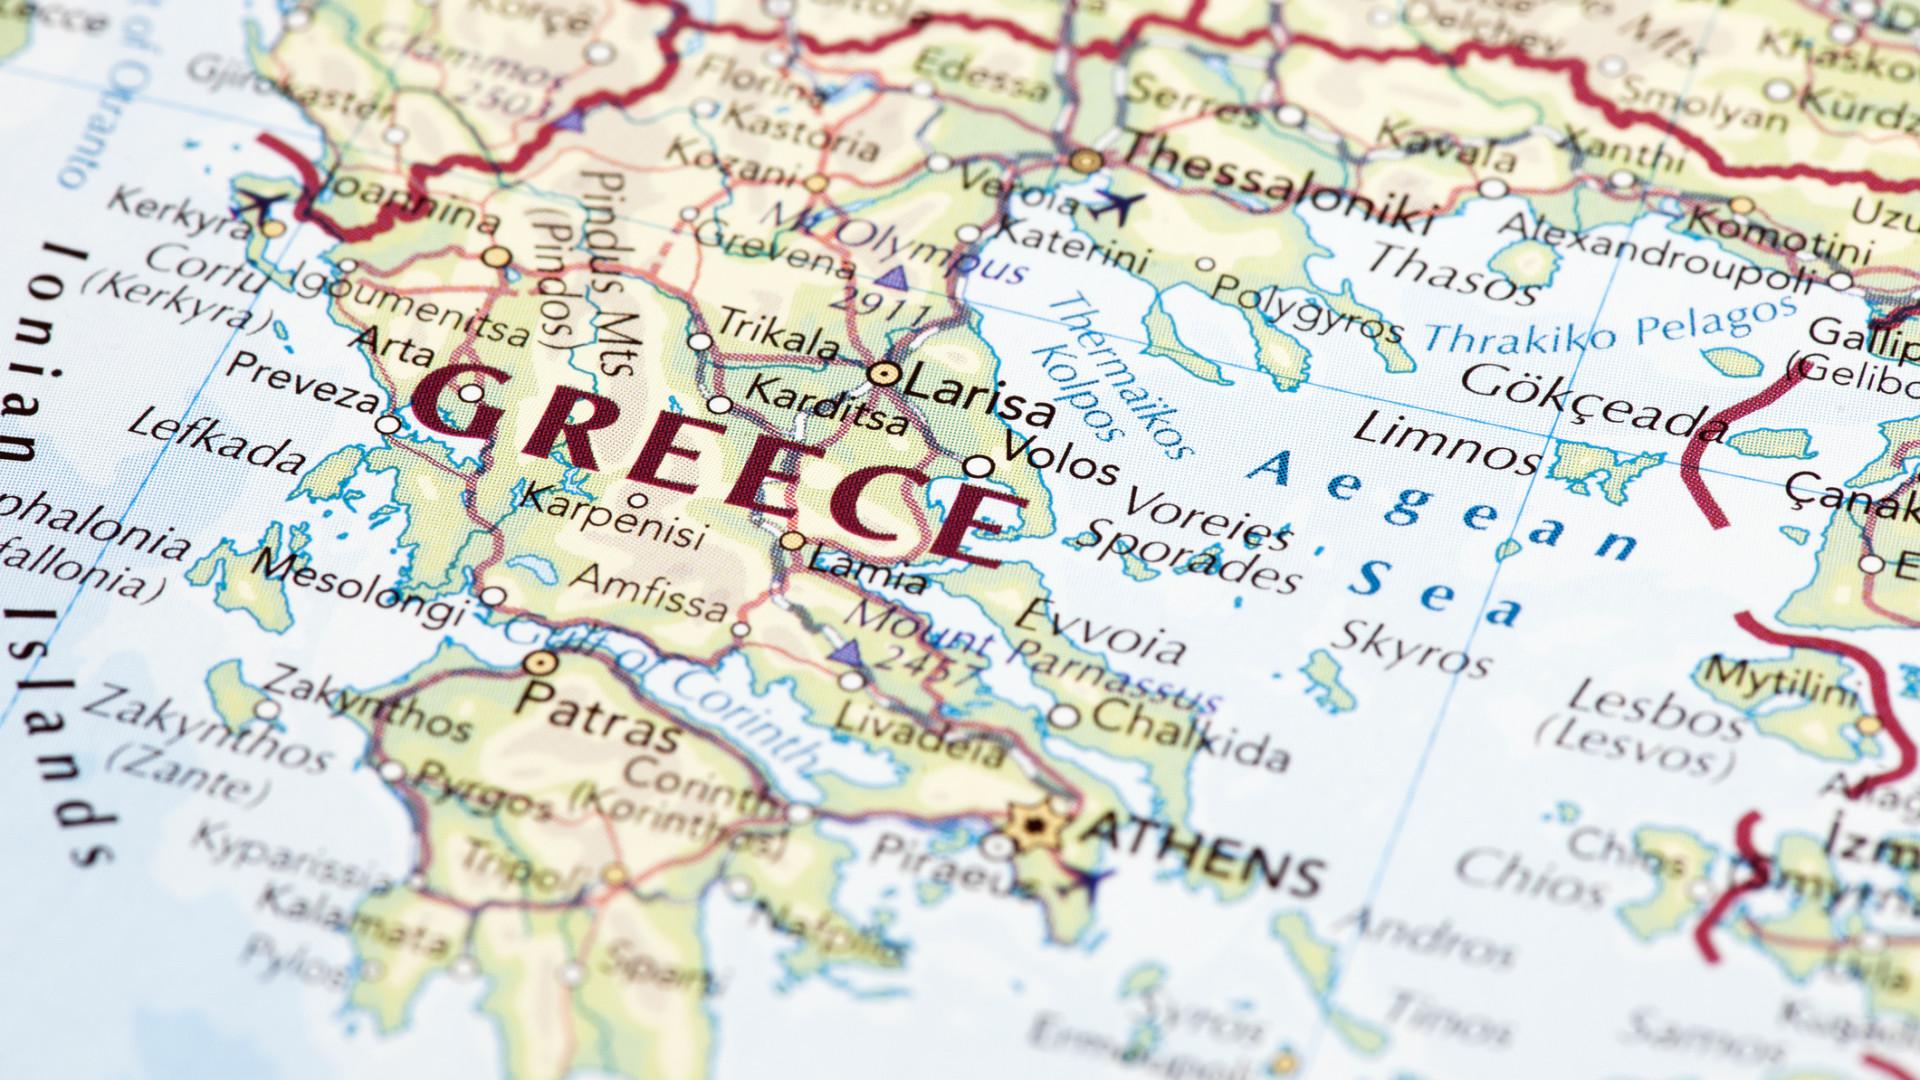 Brasil pede a Grécia dados de cinco navios suspeitos de vazamento